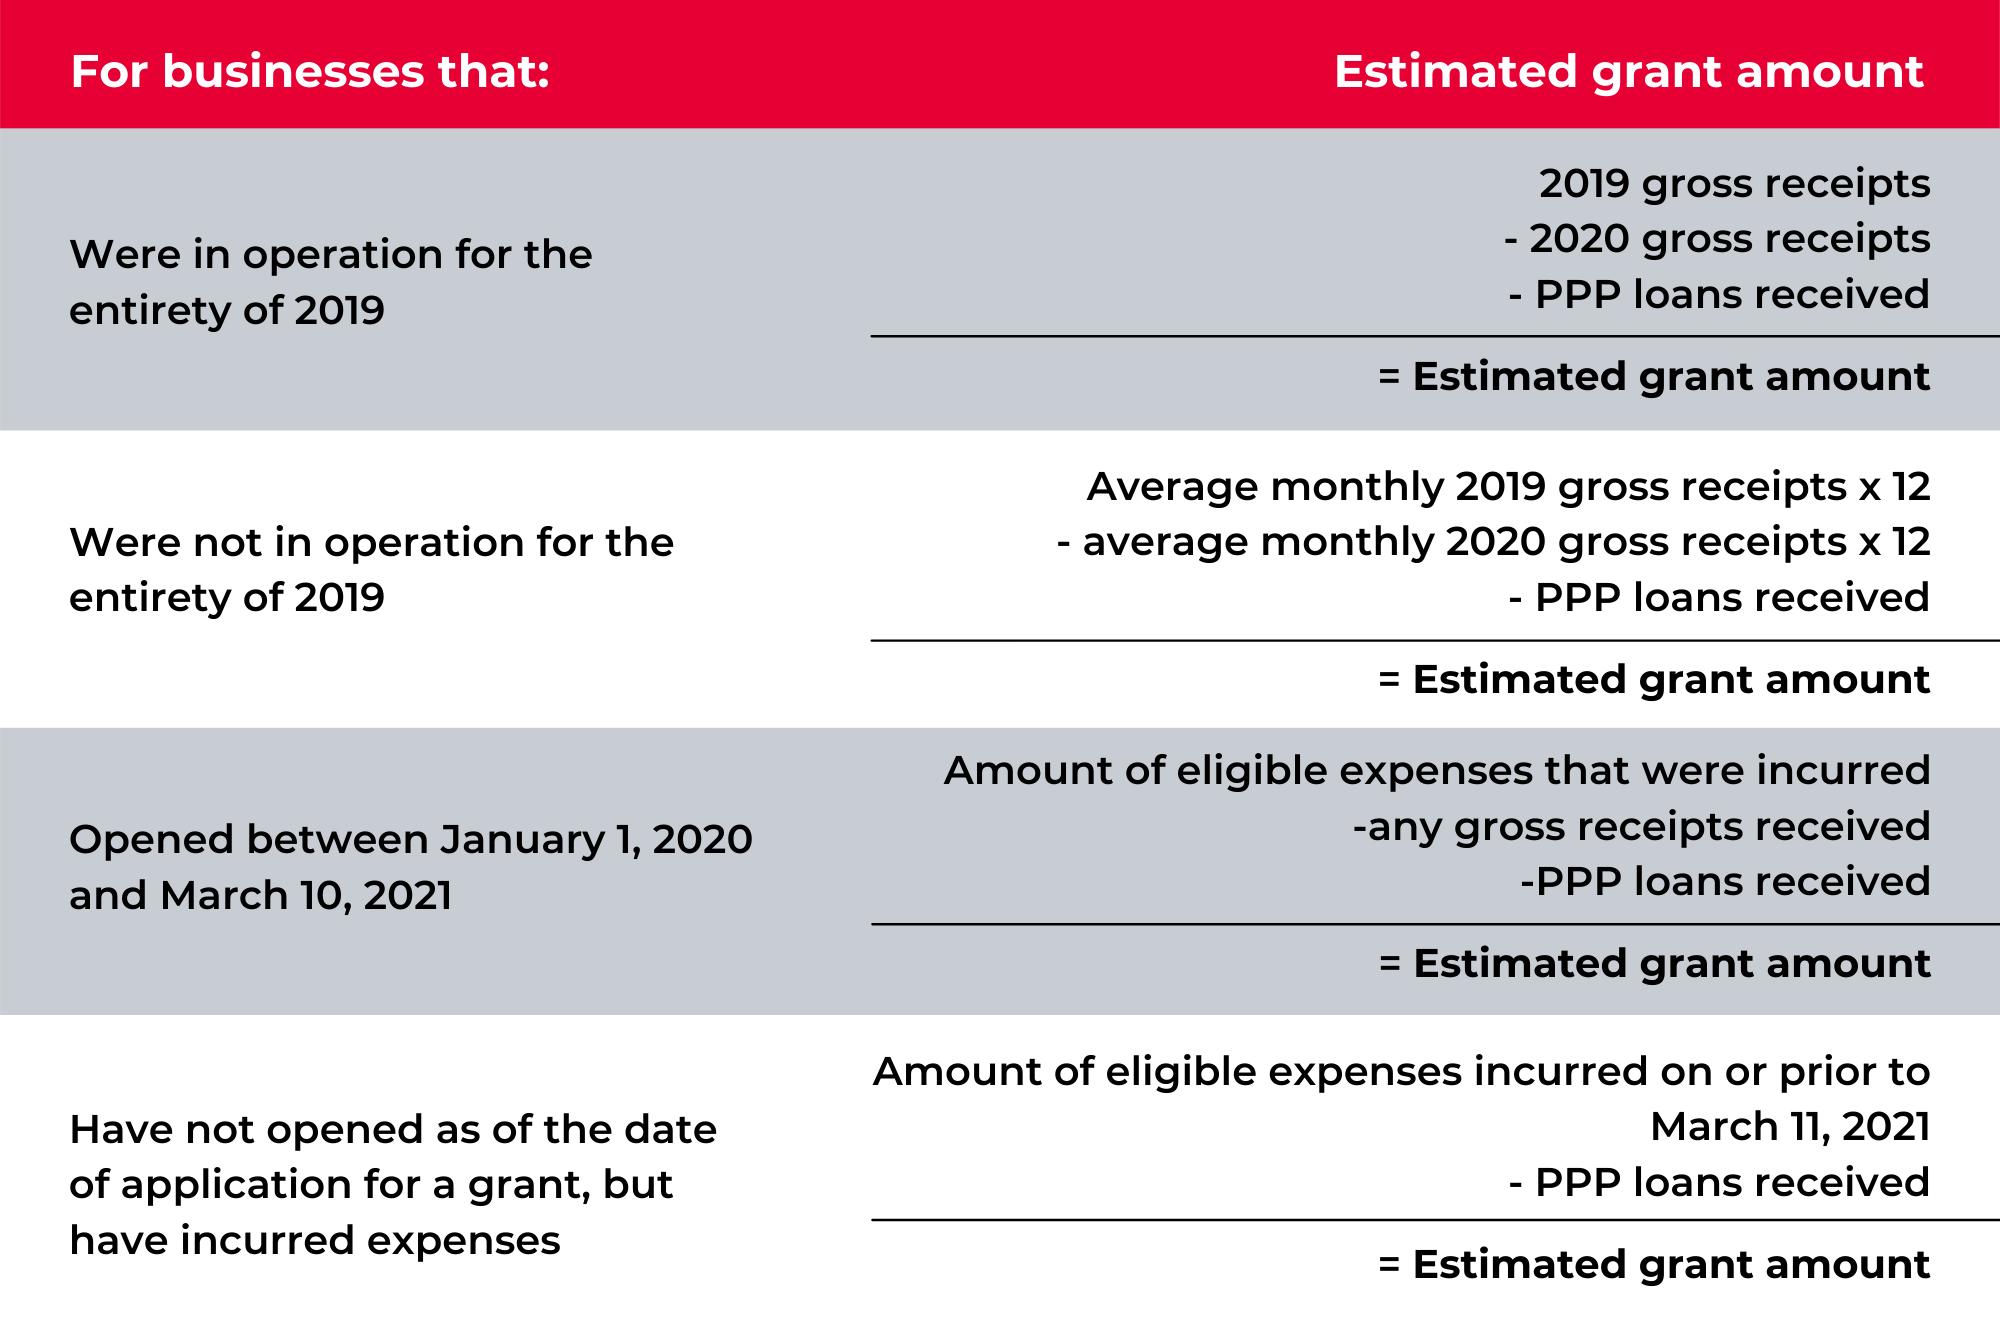 EstimatedGrants